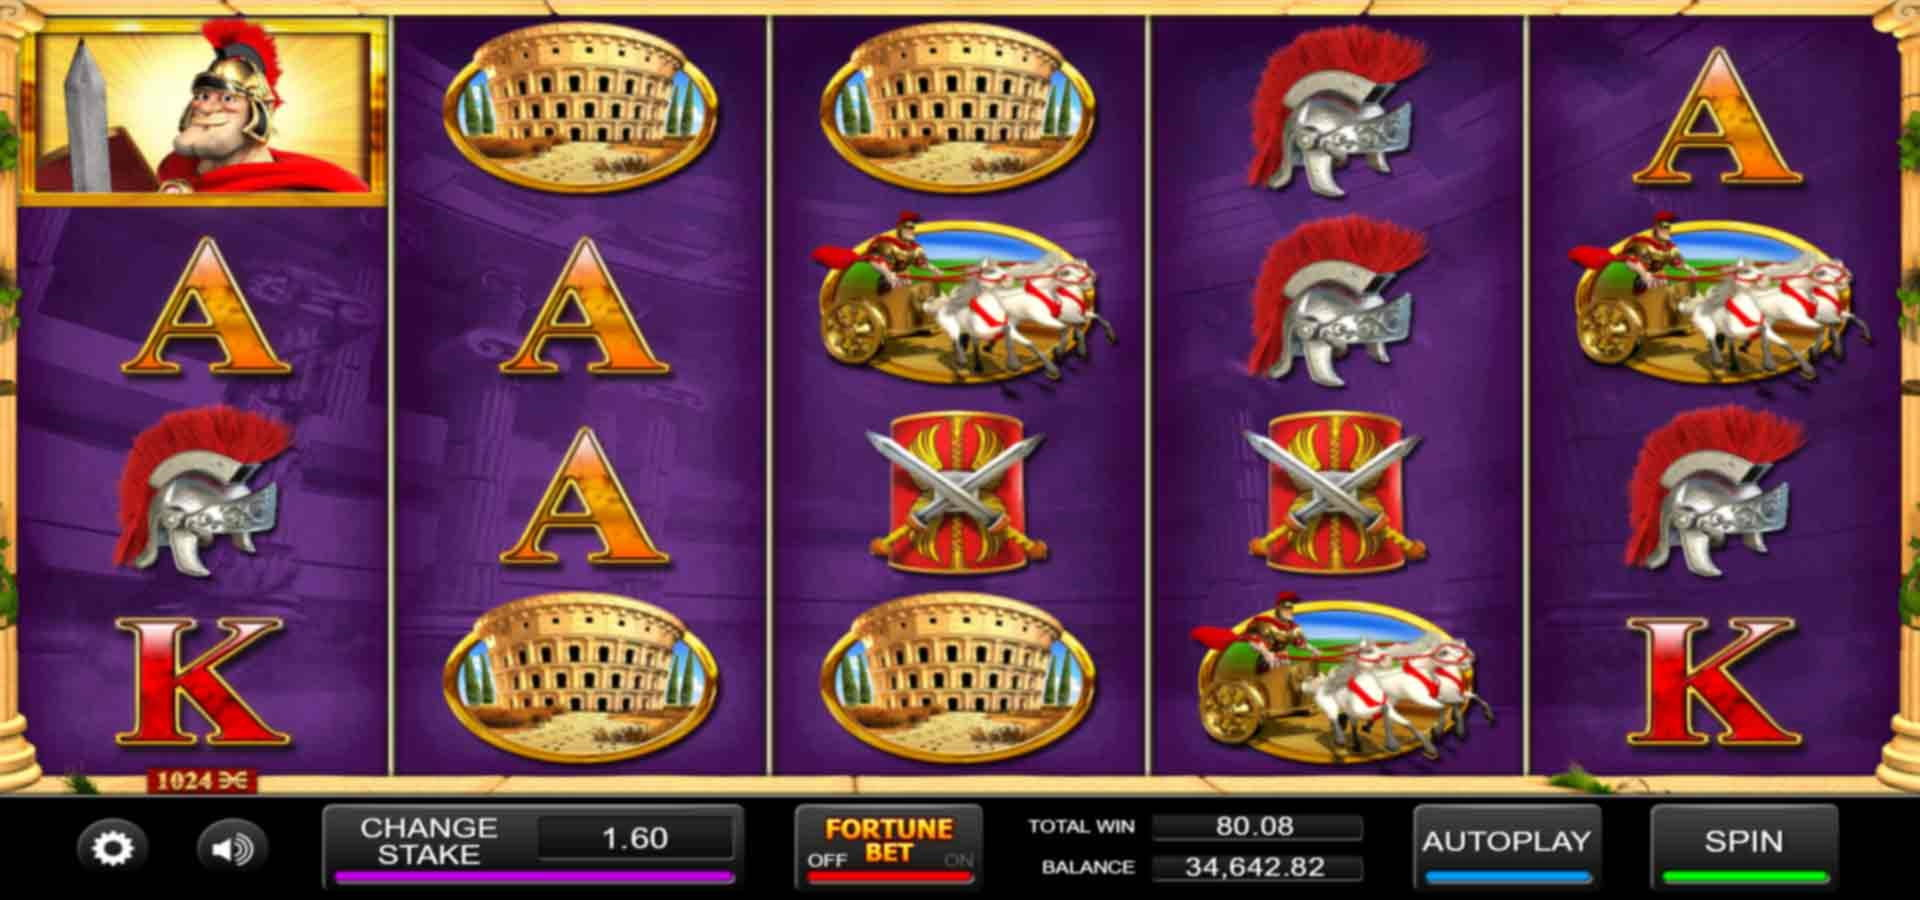 740% Няма Правілы Бонус! у Casino.com